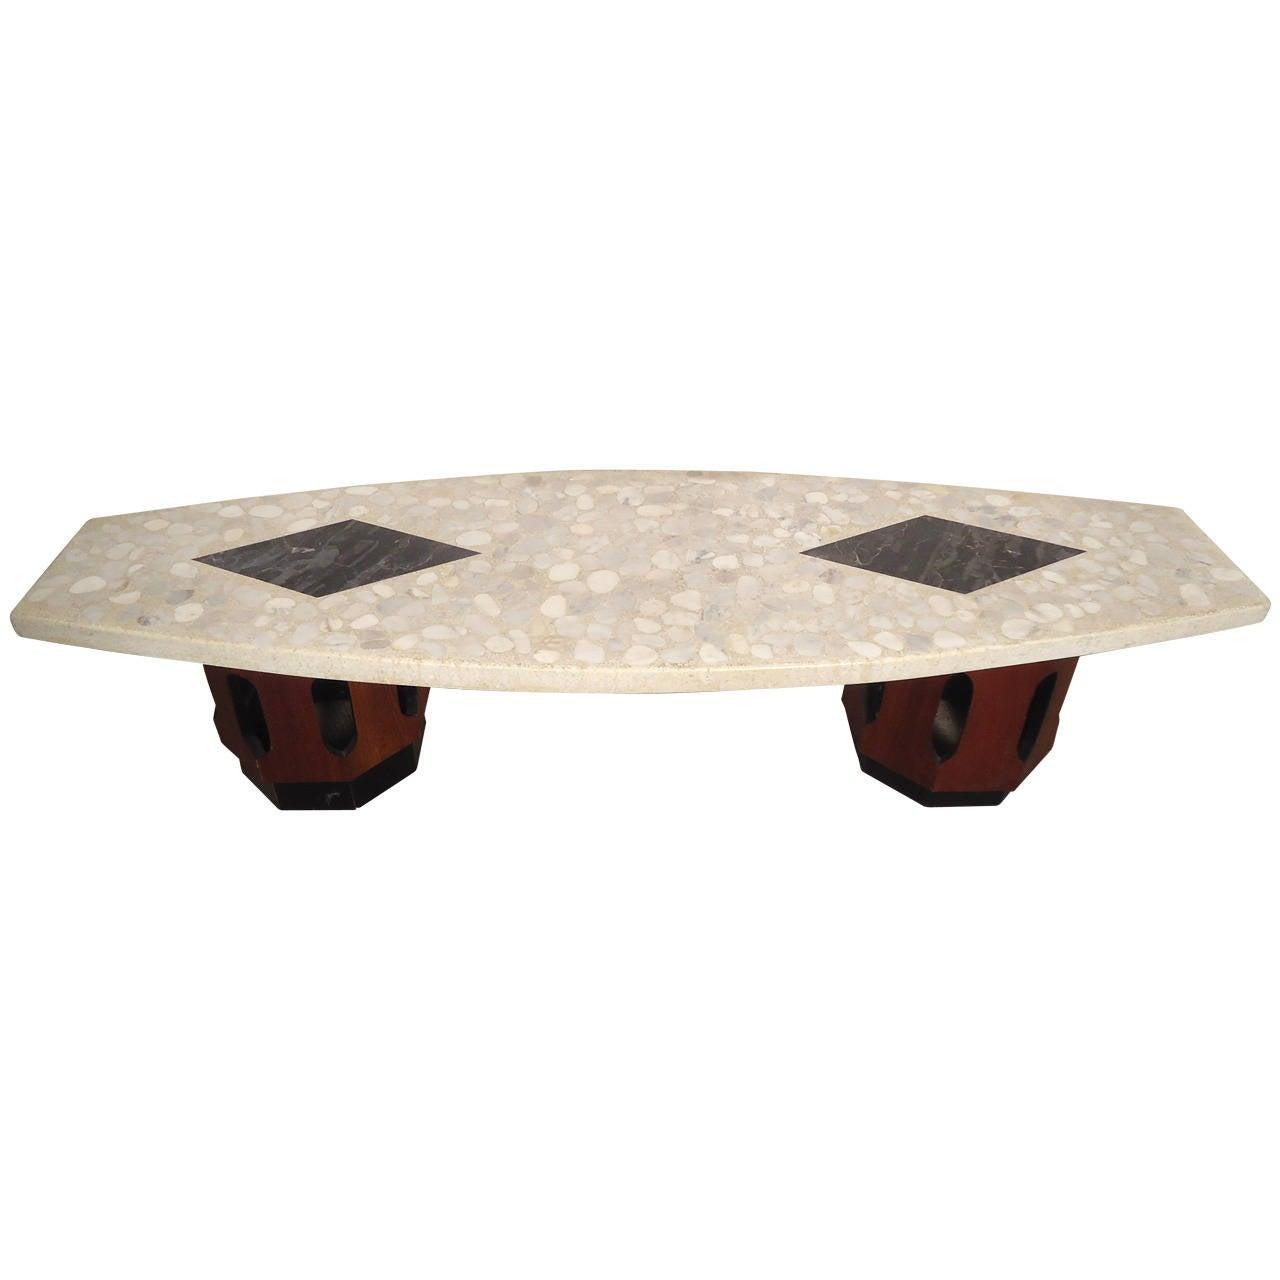 Superb Harvey Probber Terrazzo Top Table